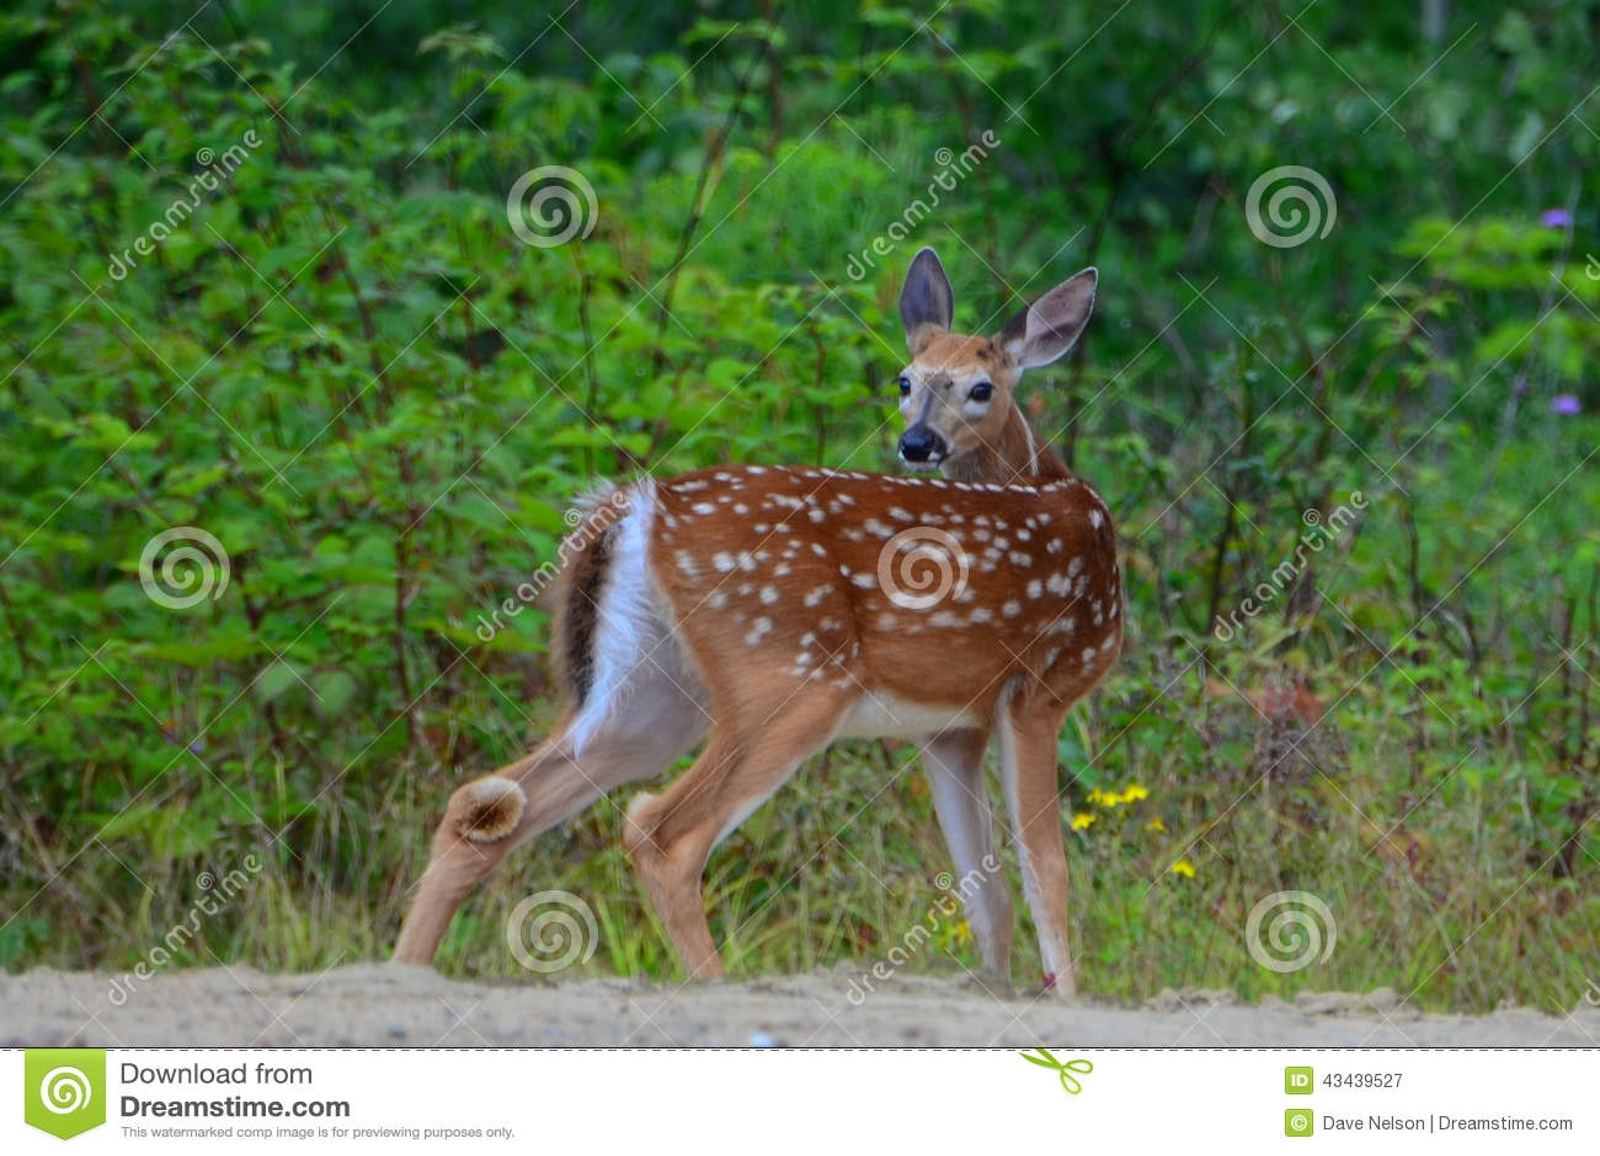 Alert white tail deer fawn